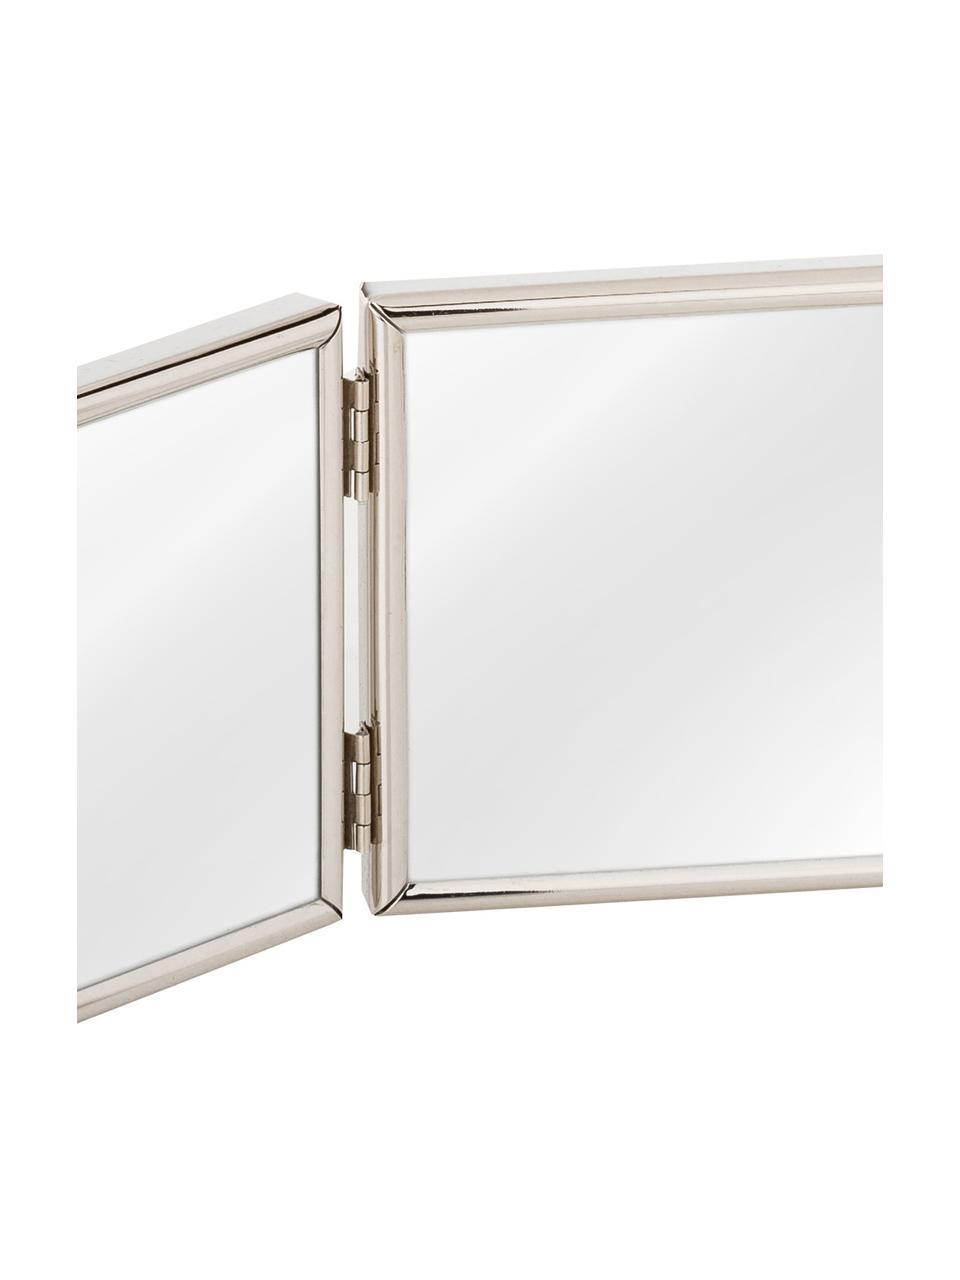 Bilderrahmen Carla, Rahmen: Metall, lackiert, Front: Glas, Rahmen: Silberfarben Front: Transparent, 15 x 10 cm